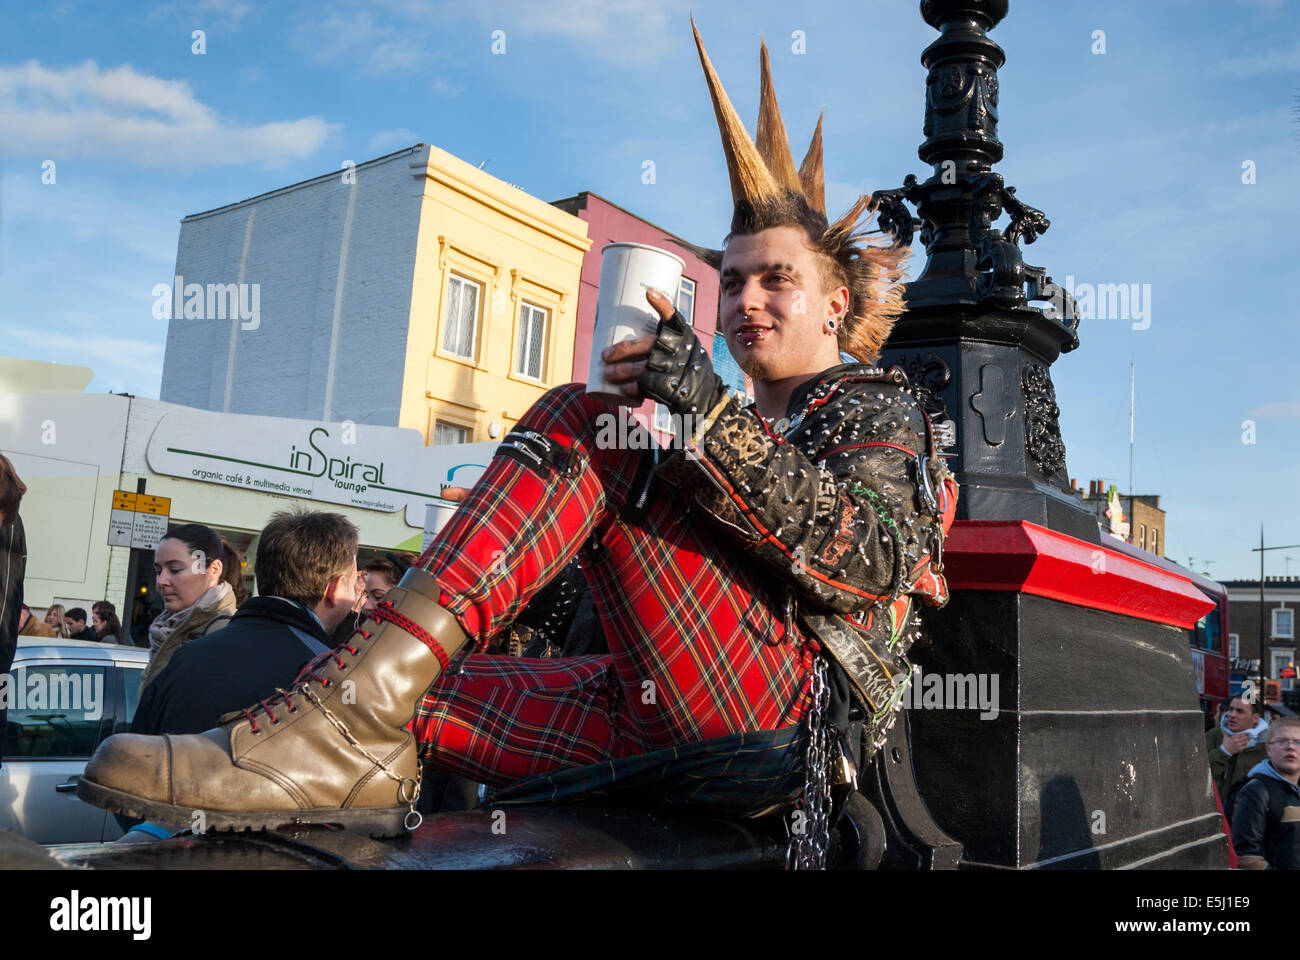 Punk Camden Town London England Uk Stock Photo